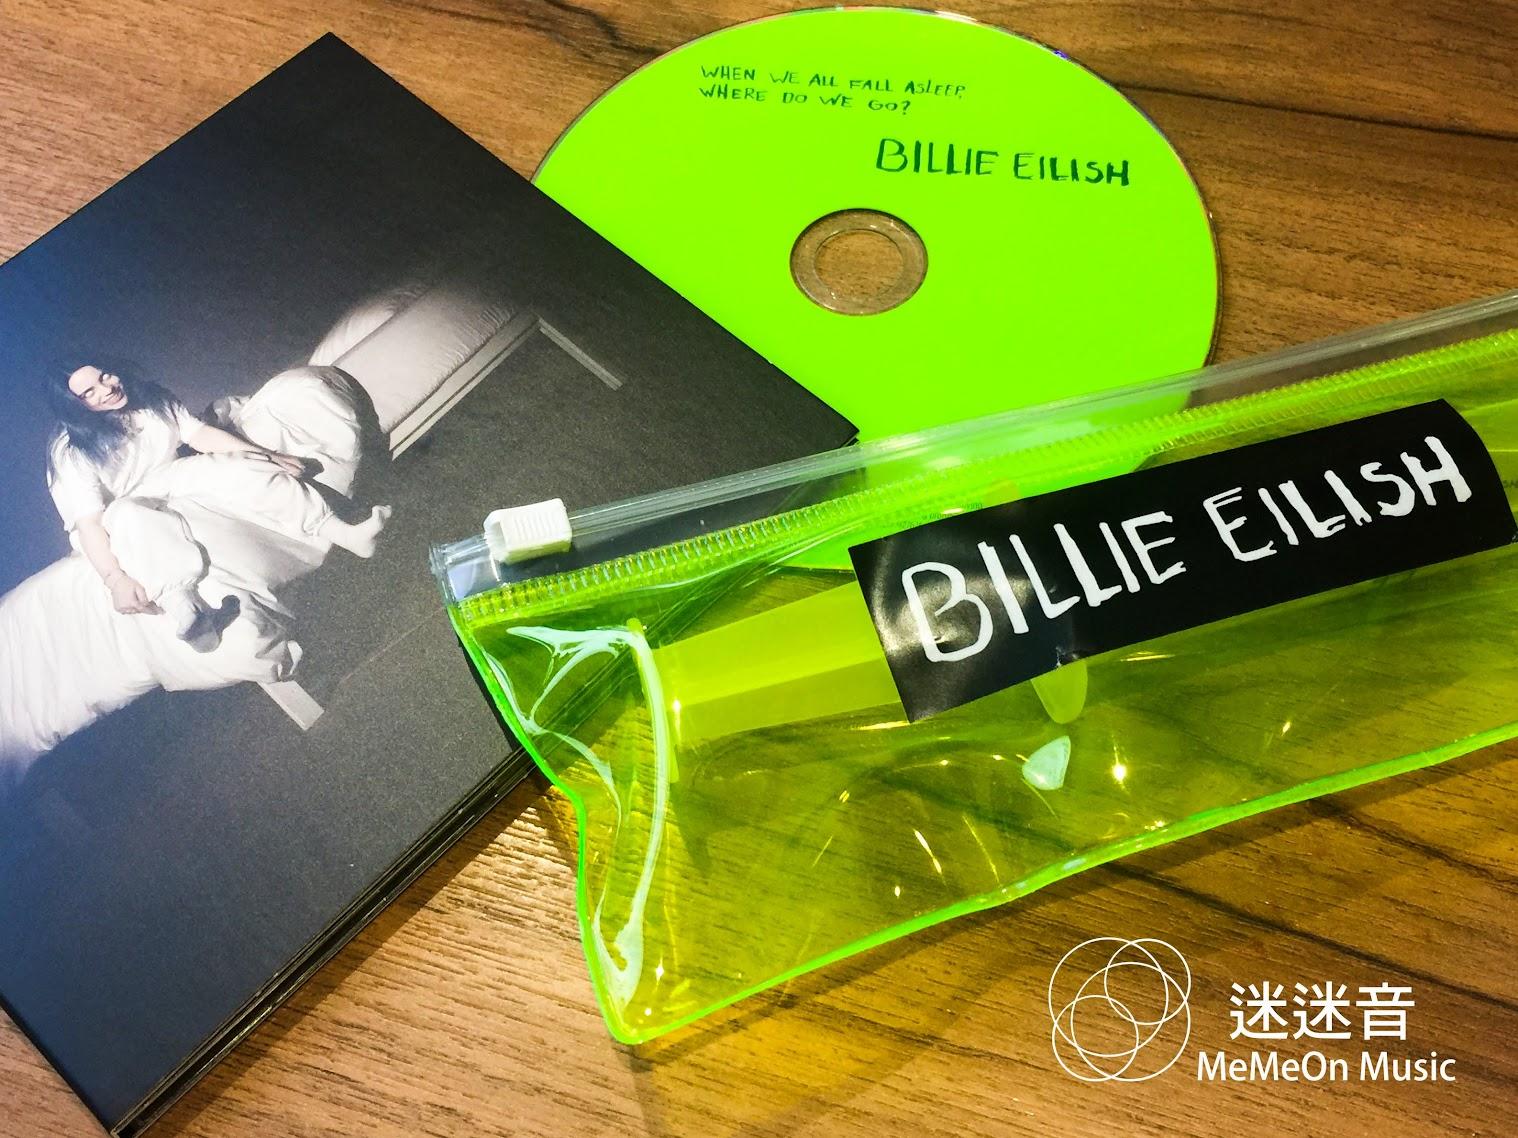 【迷編聽聽】 怪奇比莉 Billie Eilish 首張專輯《WHEN WE ALL FALL ASLEEP, WHERE DO WE GO?(當我們睡了 怪事發生了)》